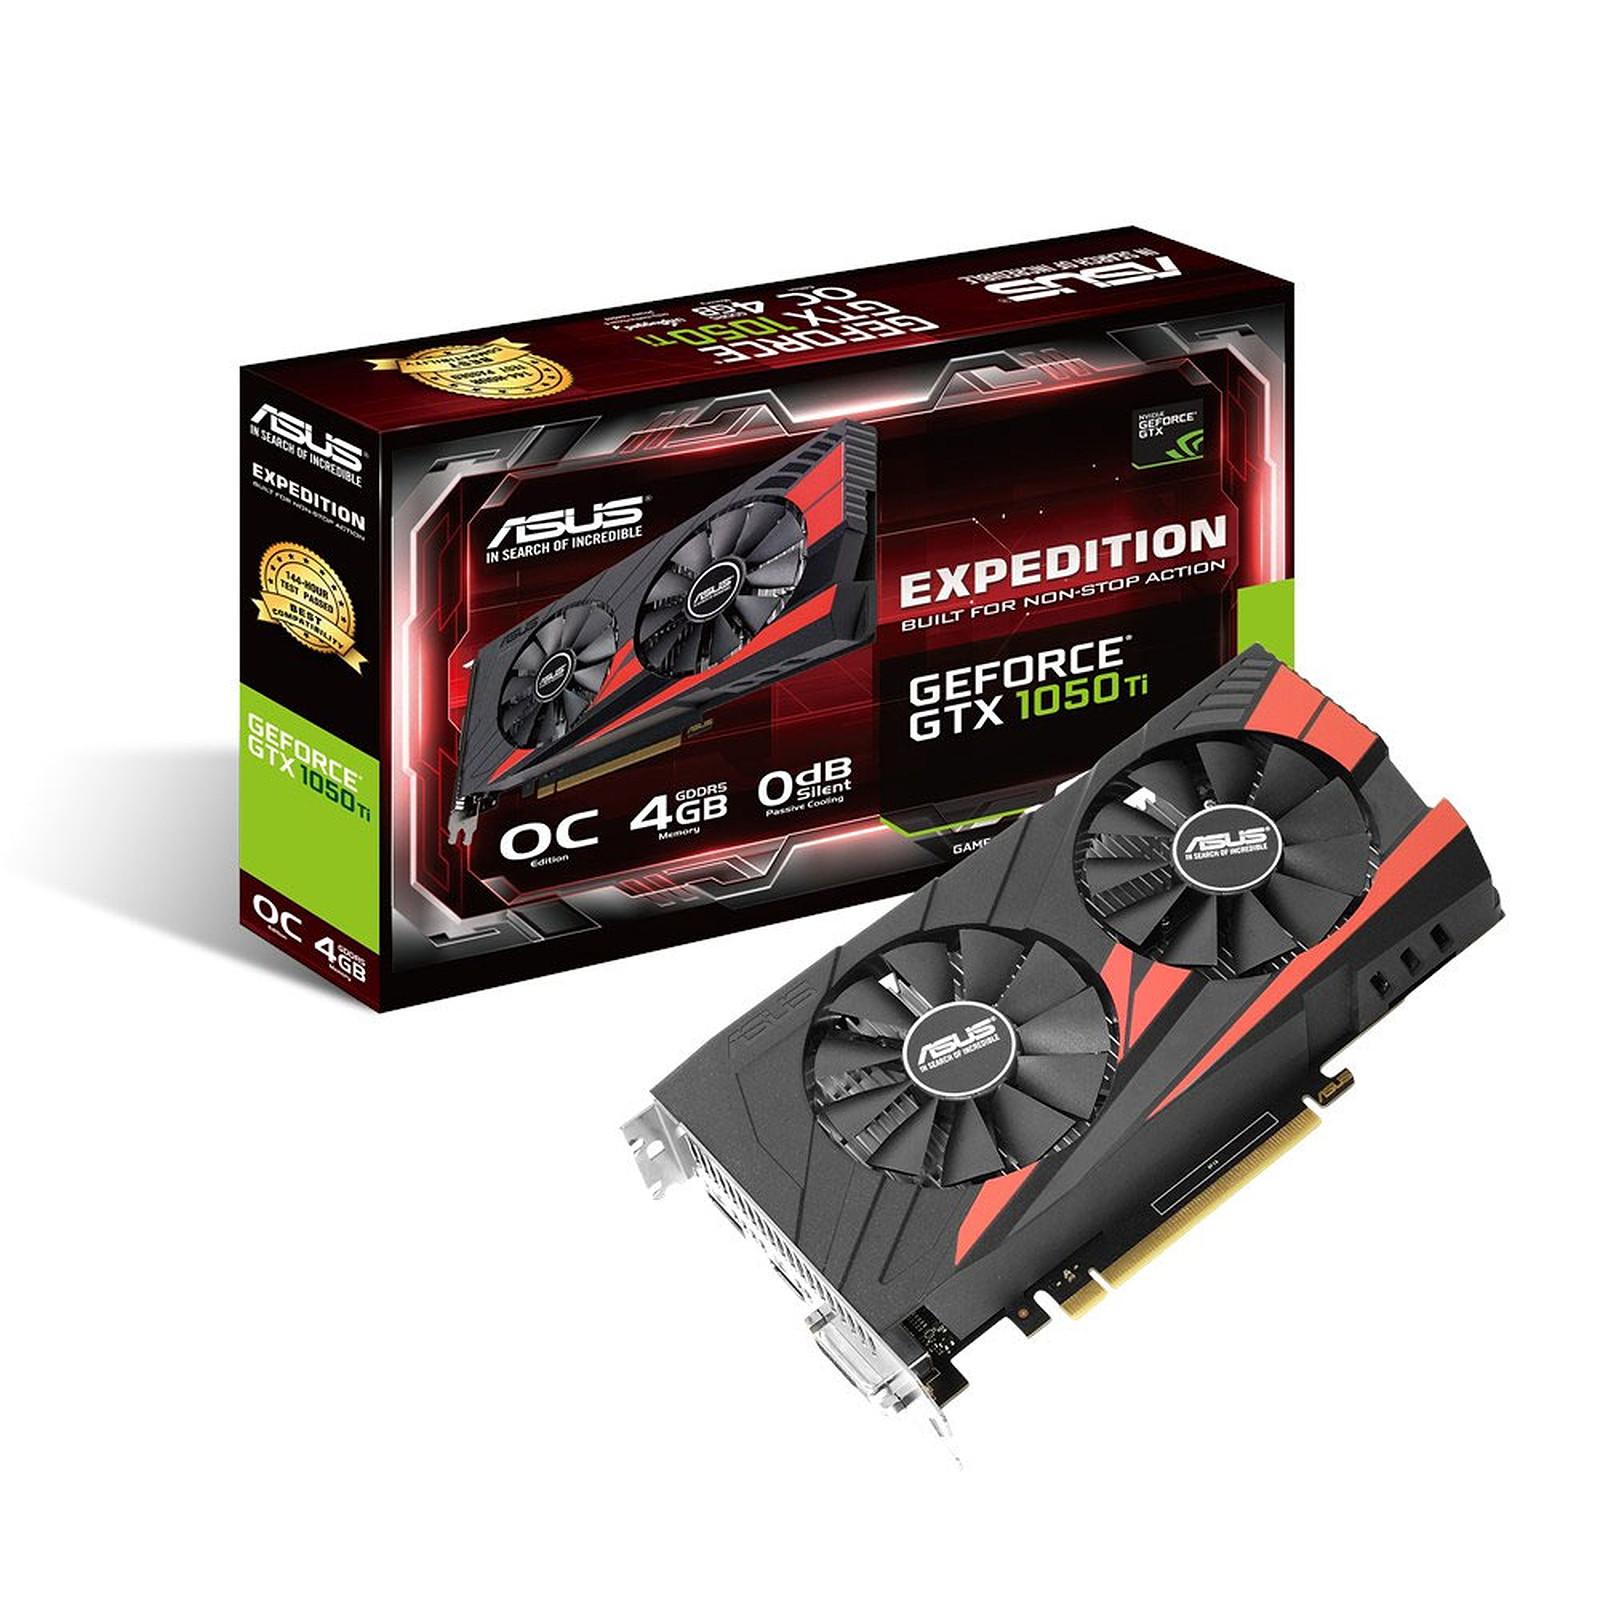 ASUS GeForce GTX 1050 Ti OC EX-GTX1050TI-O4G